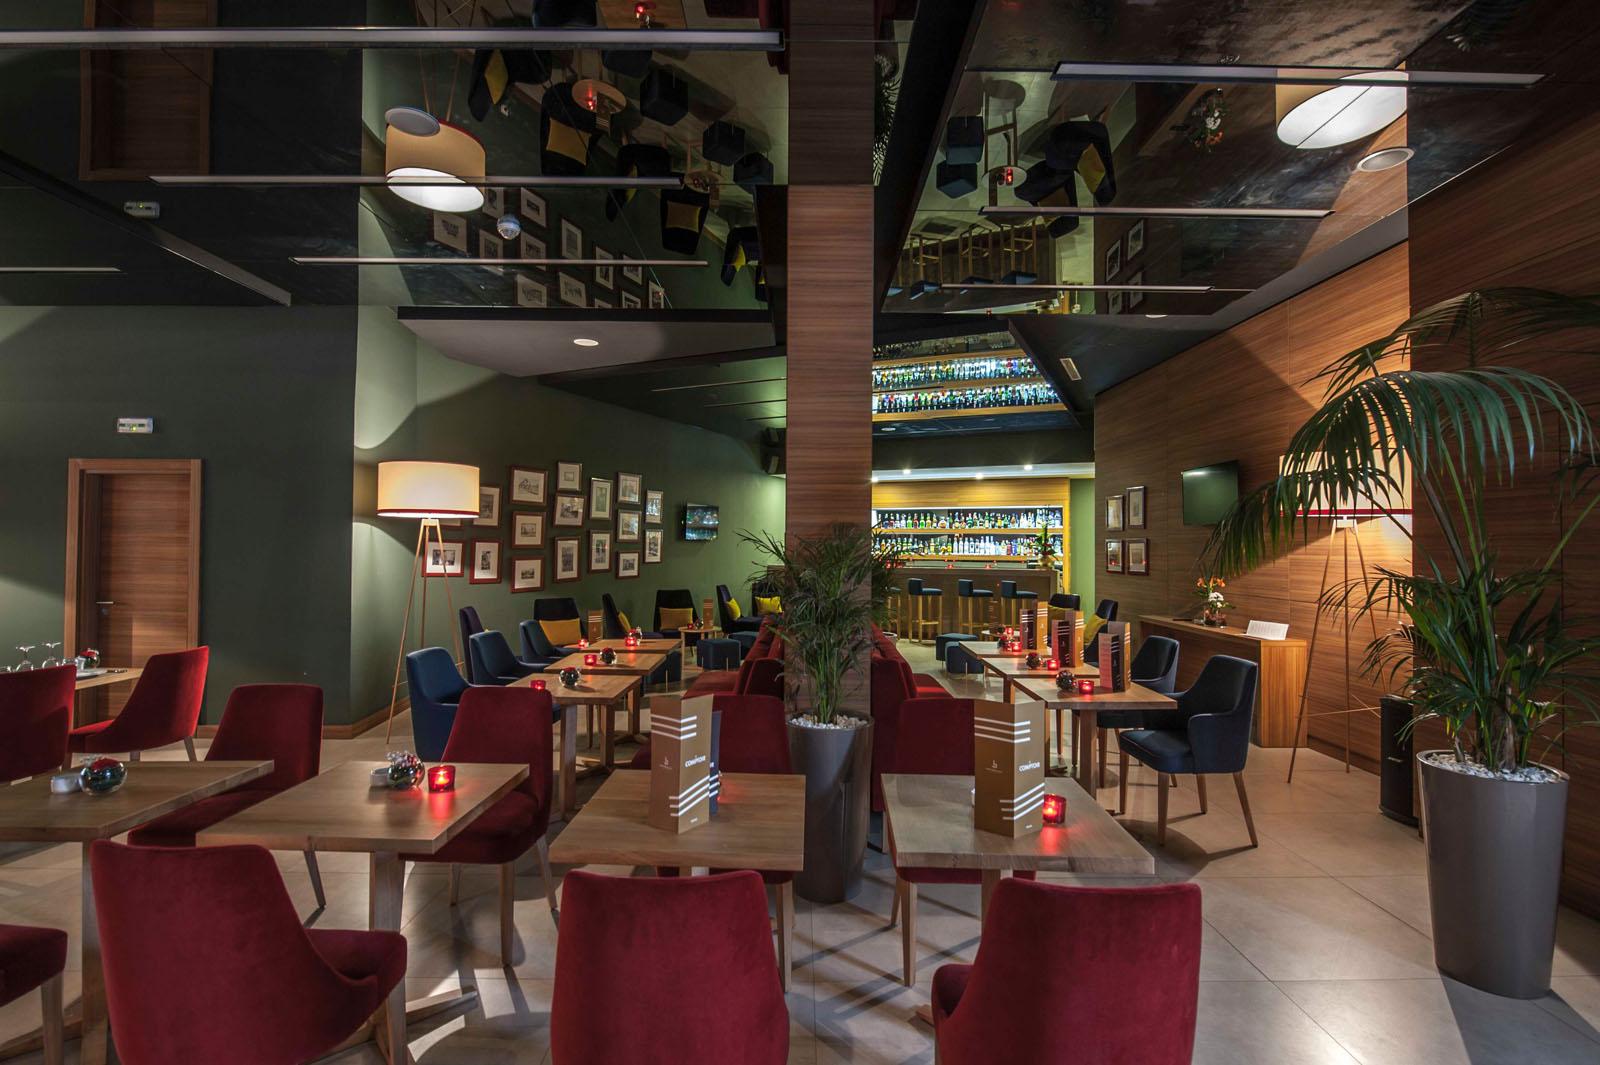 Torero Bar at Kenzi Basma Hotel in Casablanca, Morocco